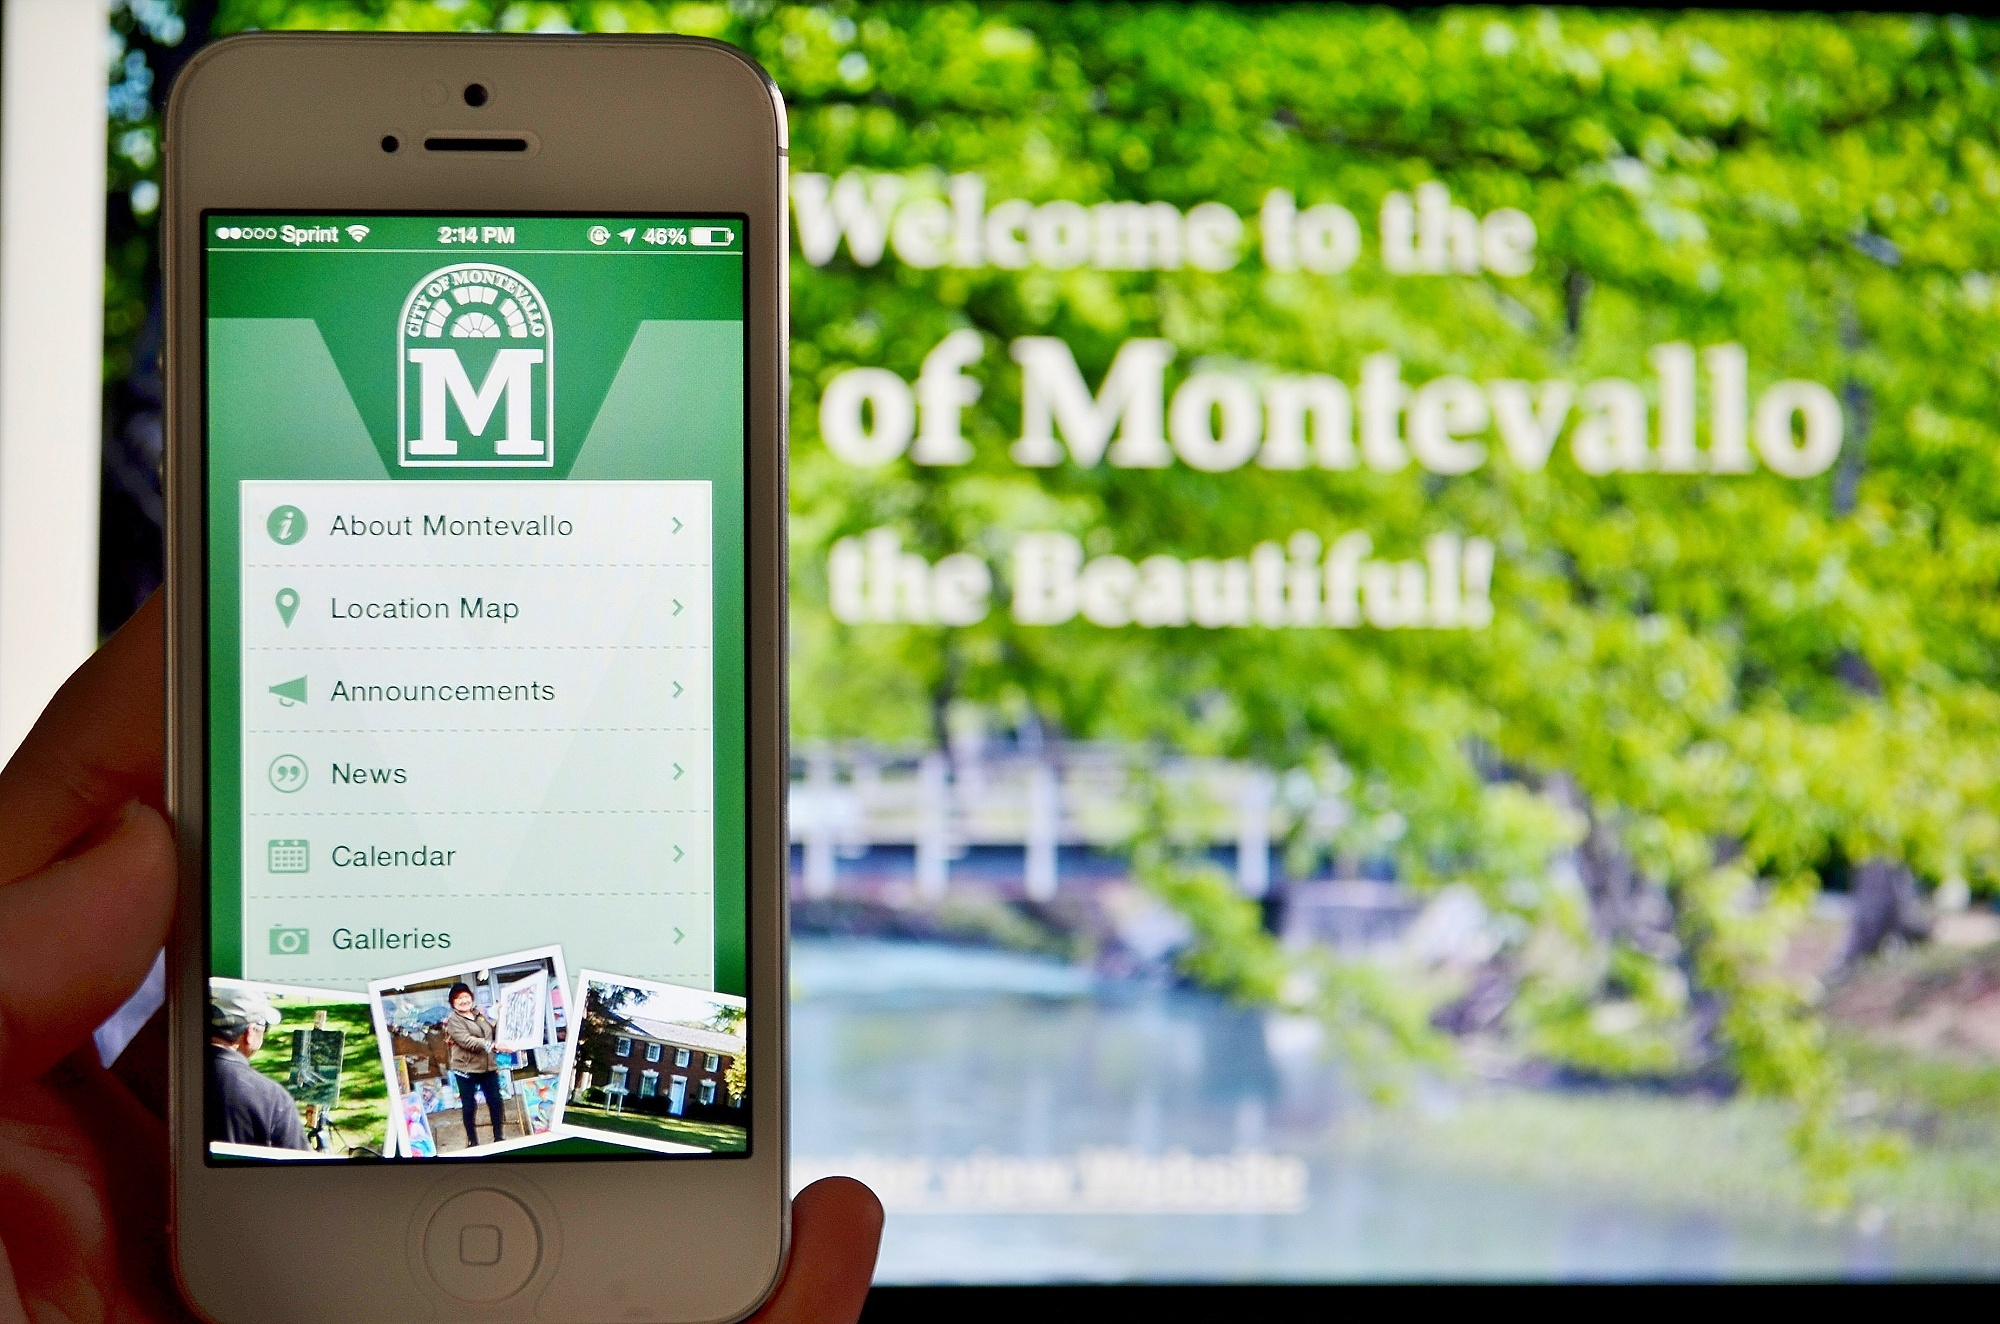 City of Montevallo debuts new smartphone app